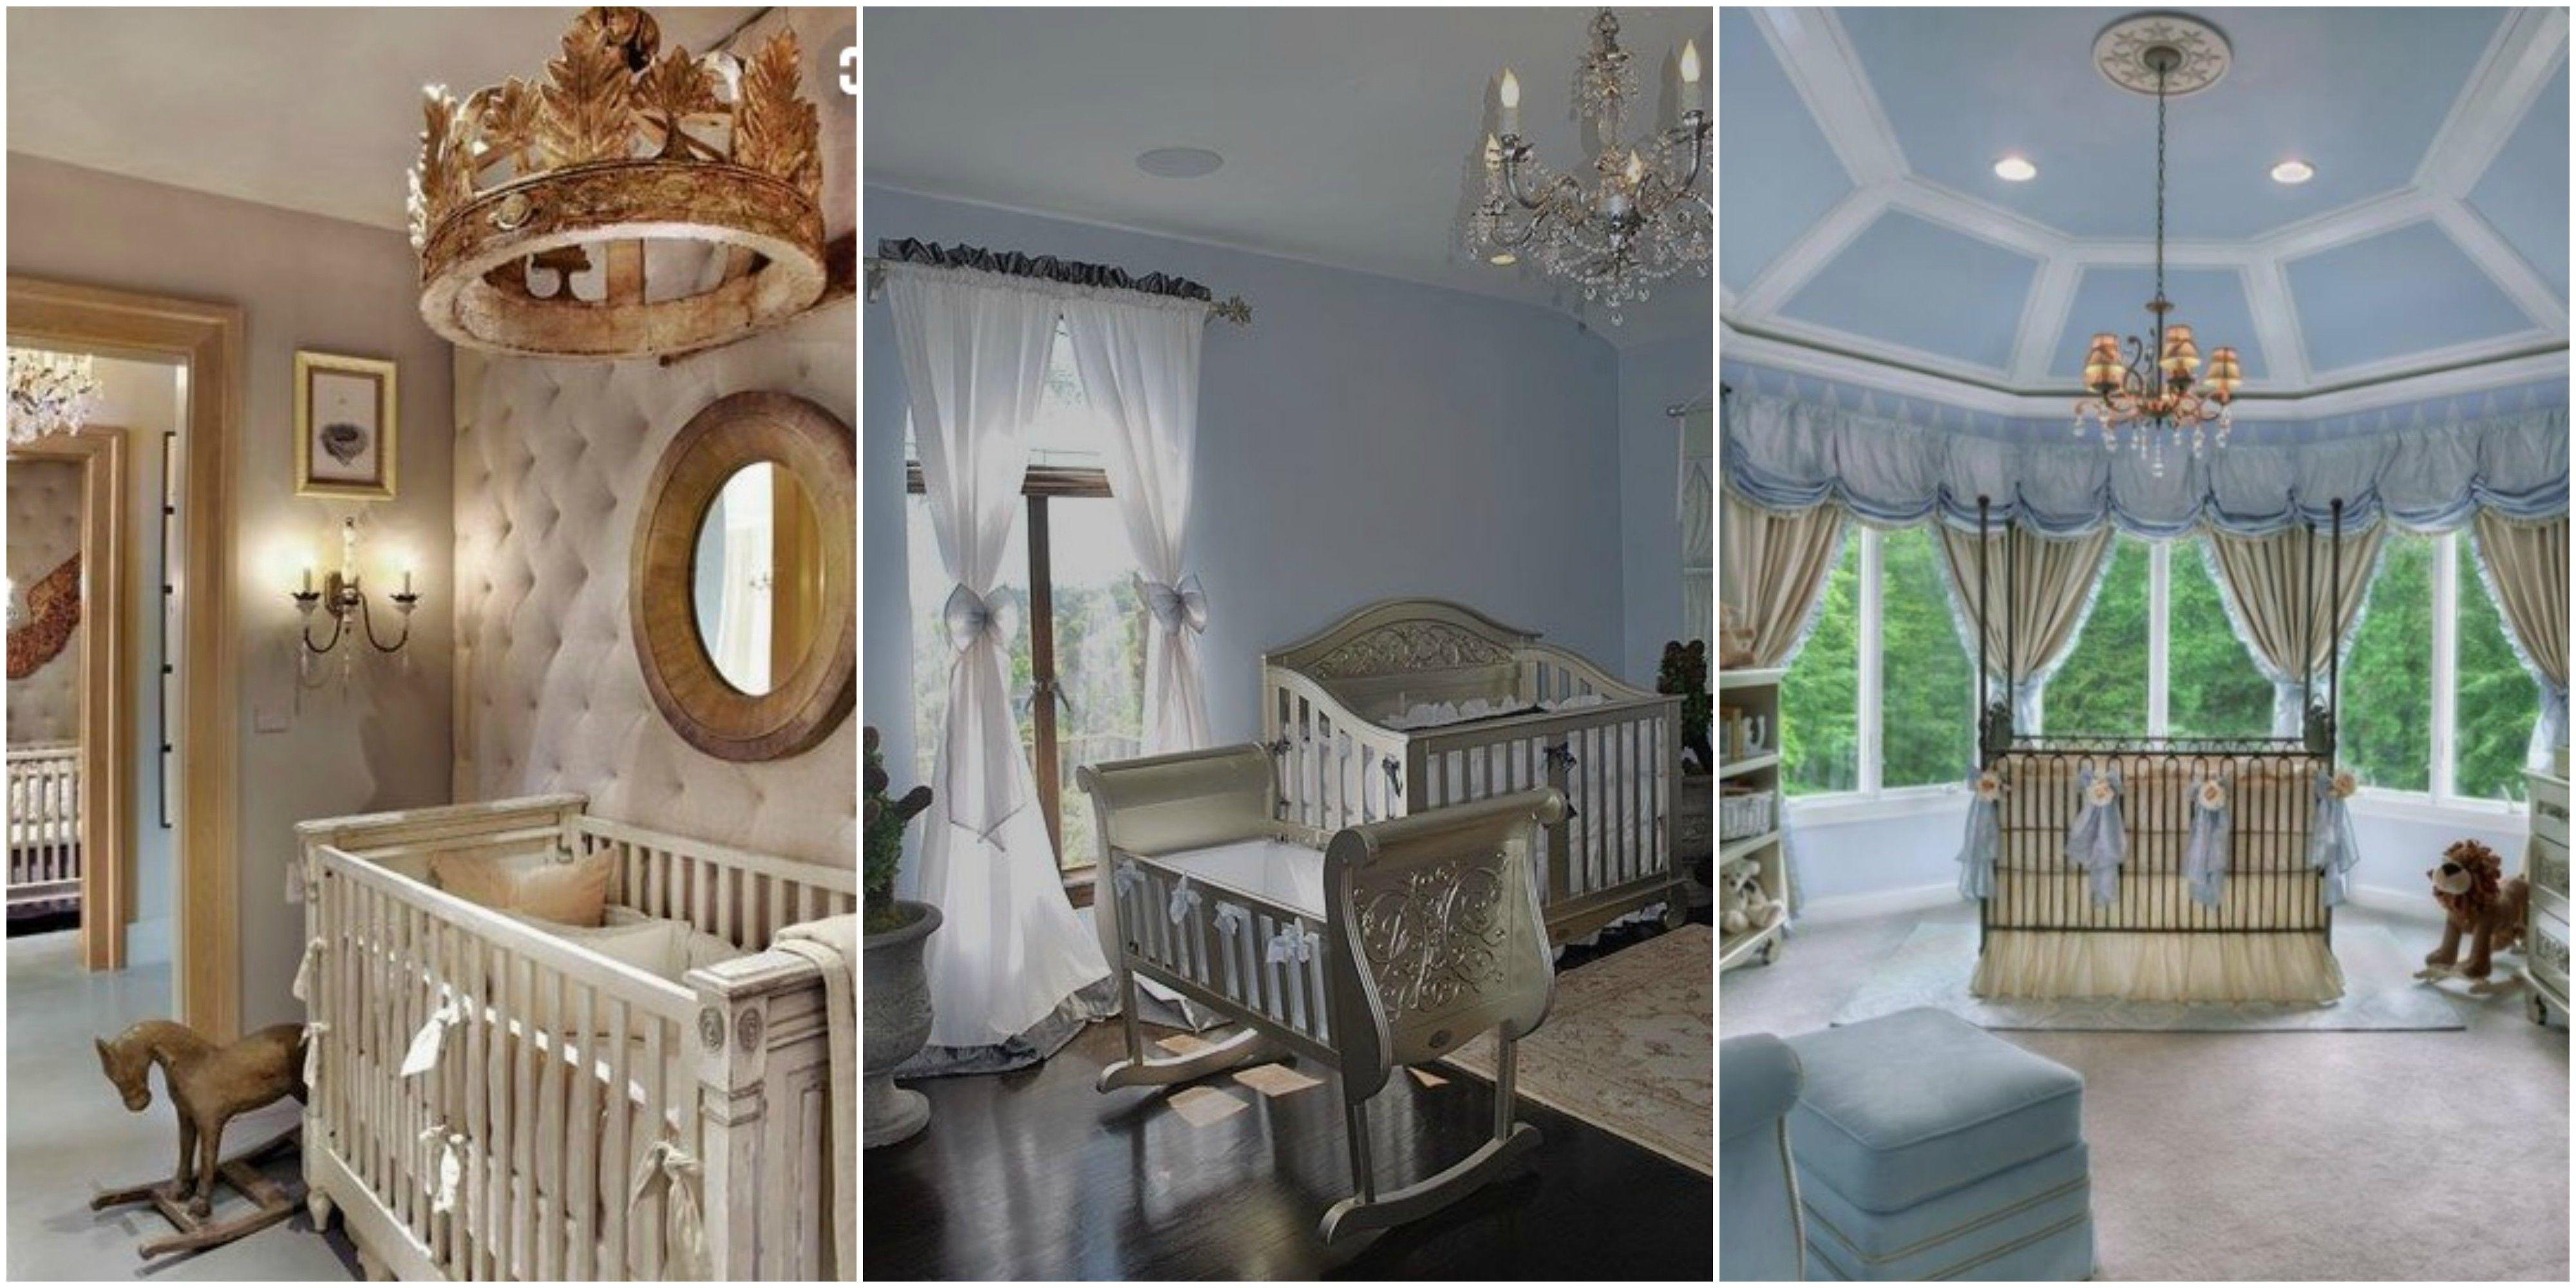 Royal Baby Nursery Room Ideas